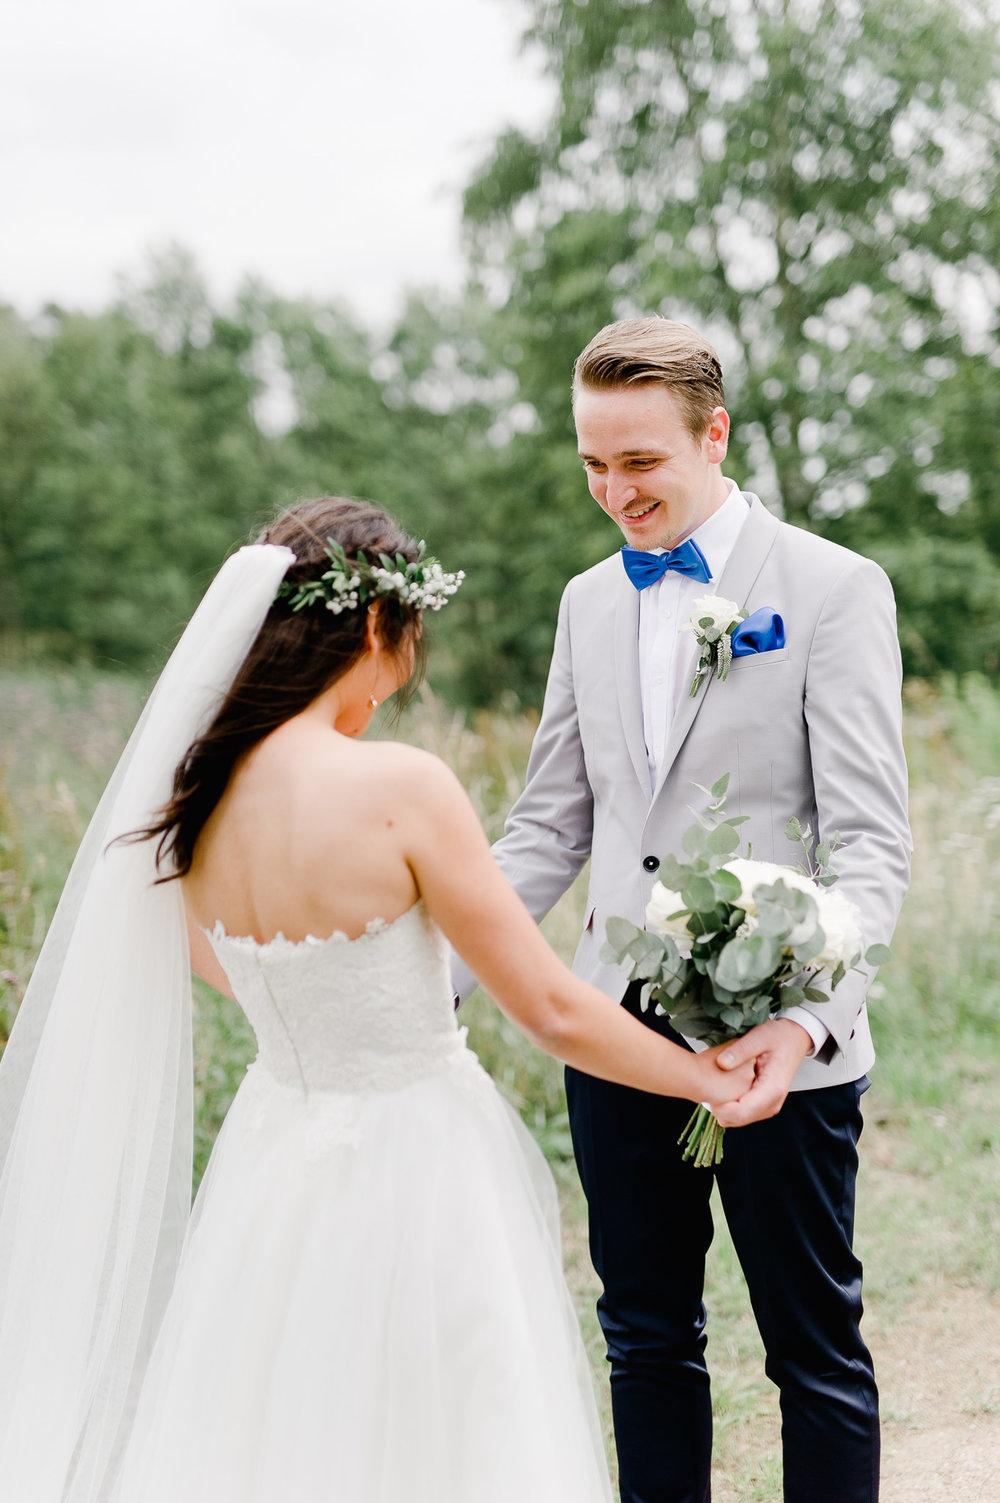 Anna_Hari_Wedding_Photography-38.jpg